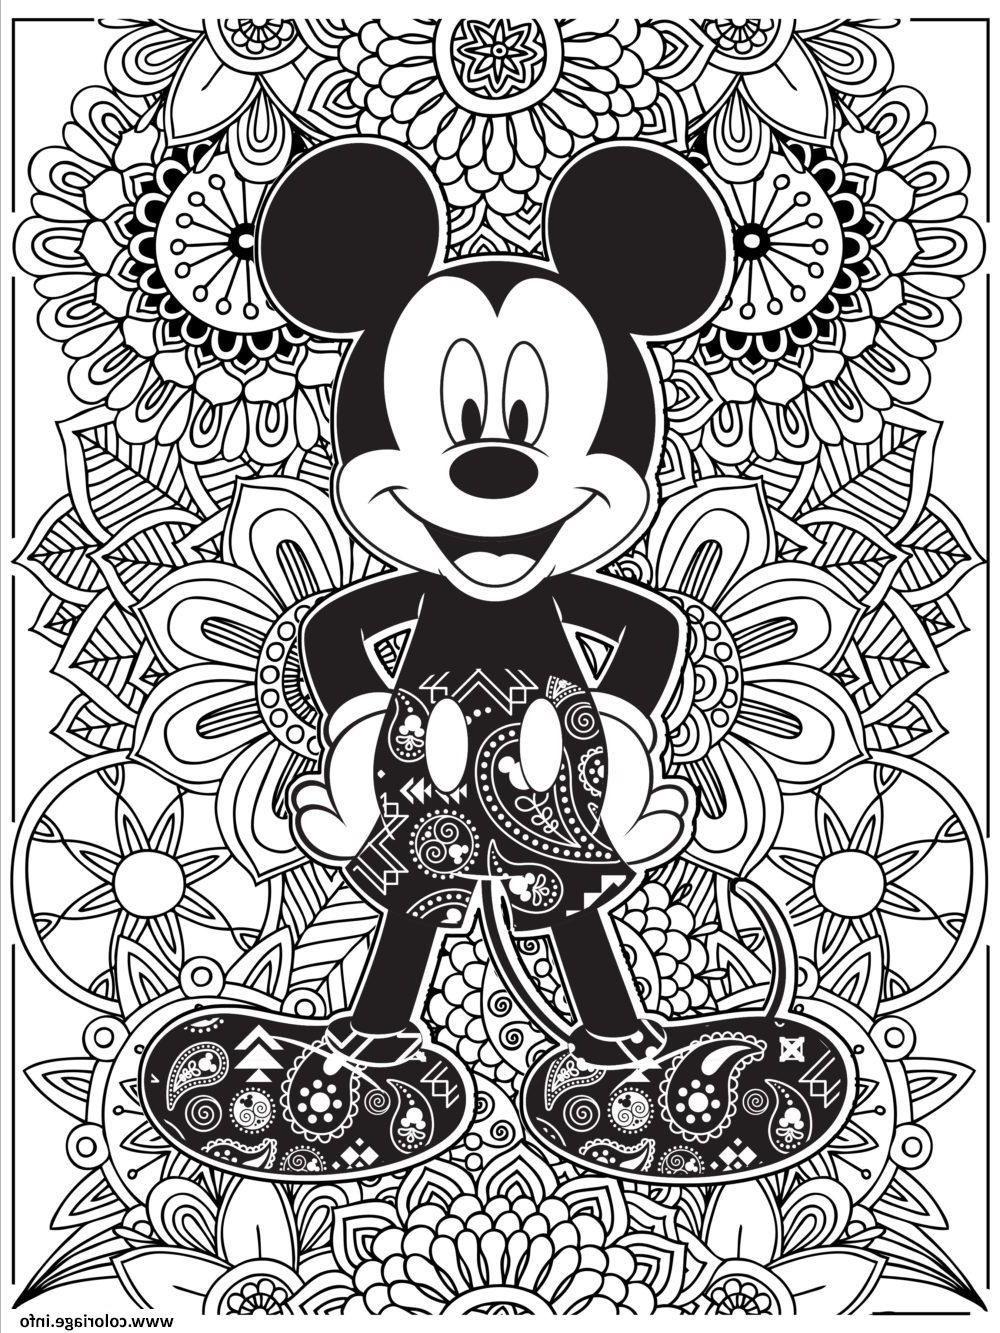 20 Impressionnant De Coloriage Difficile Disney Galerie in 20